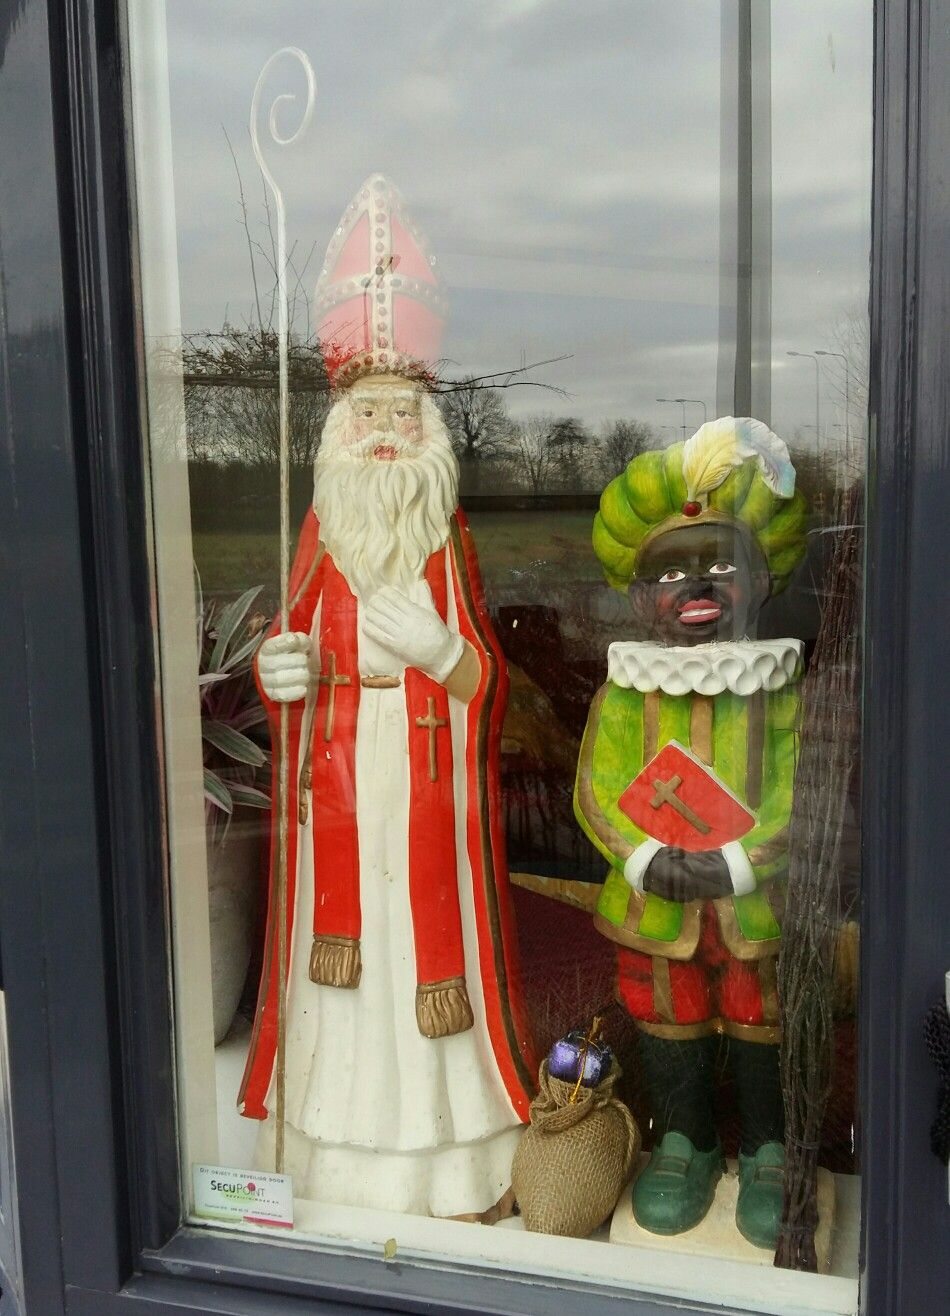 Sinterklaas Etalage Decoratie Sinterklaas Zwarte Piet Sint Nicolaas